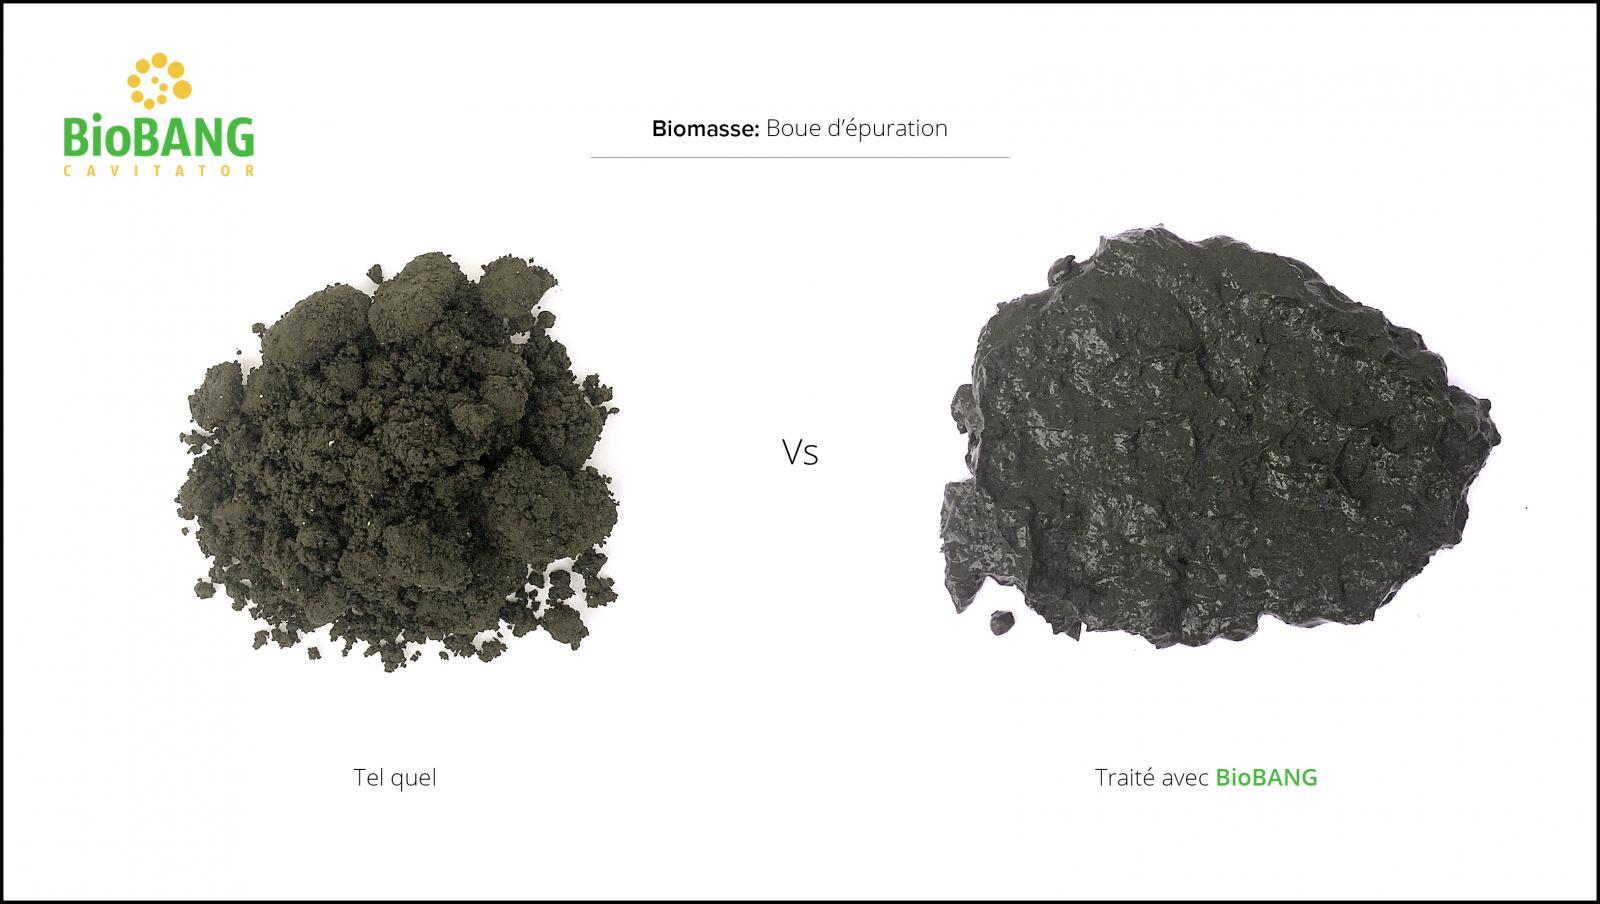 traitement_biomasse_boue_depuration